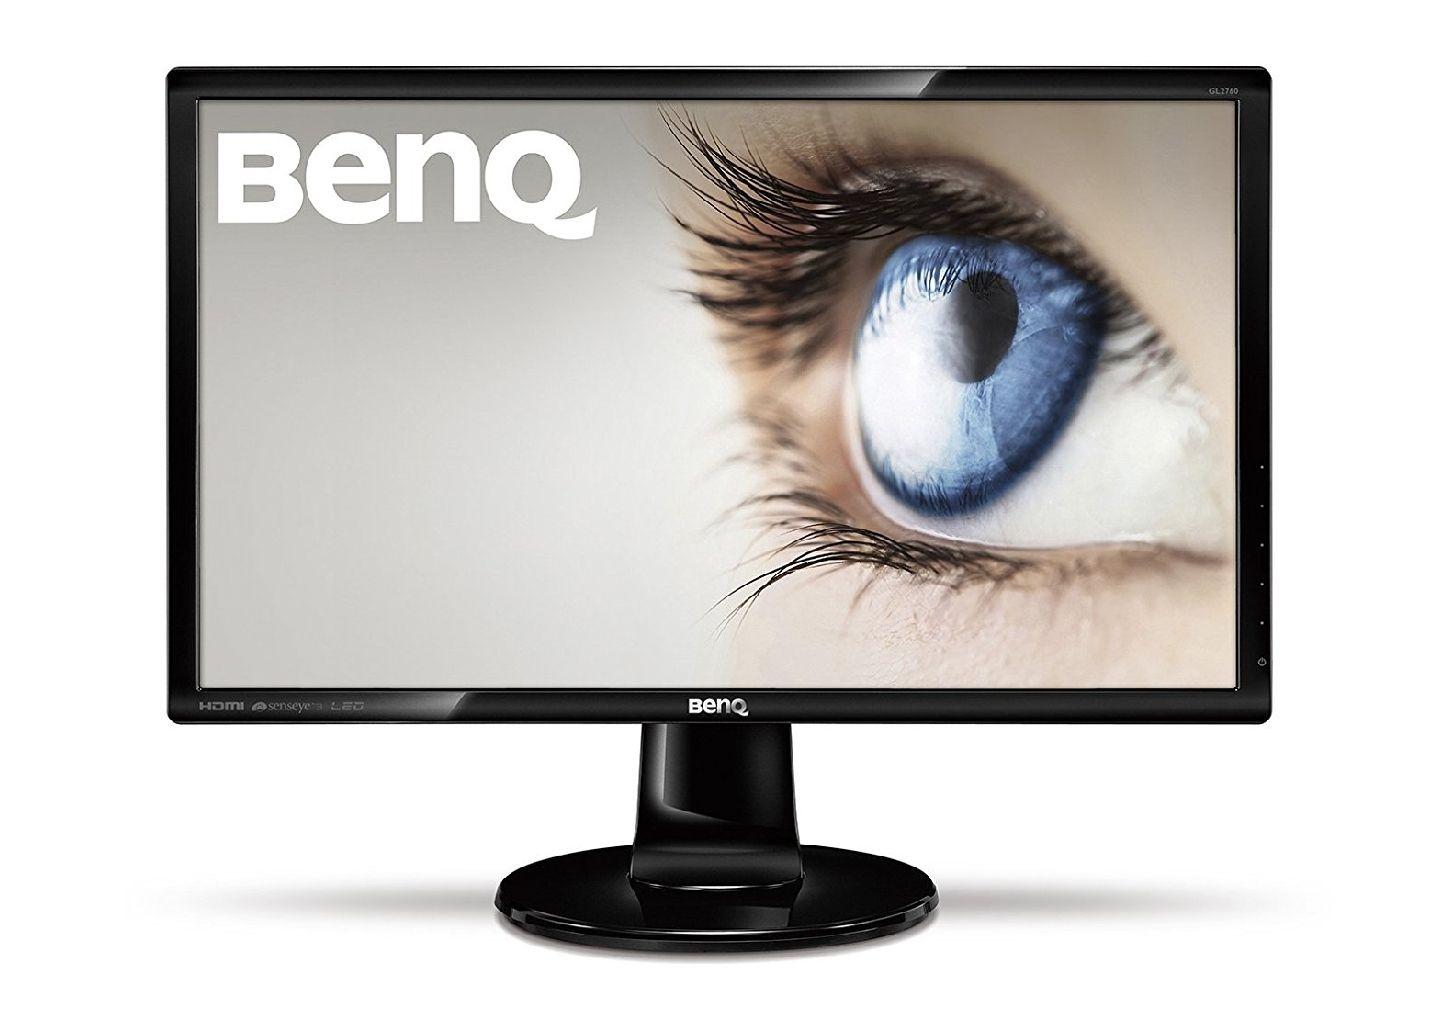 [amazon] BenQ GL2760H 68,6 cm (27 Zoll) Monitor (Full-HD, Eye-Care, HDMI, VGA, 2ms Reaktionszeit) schwarz